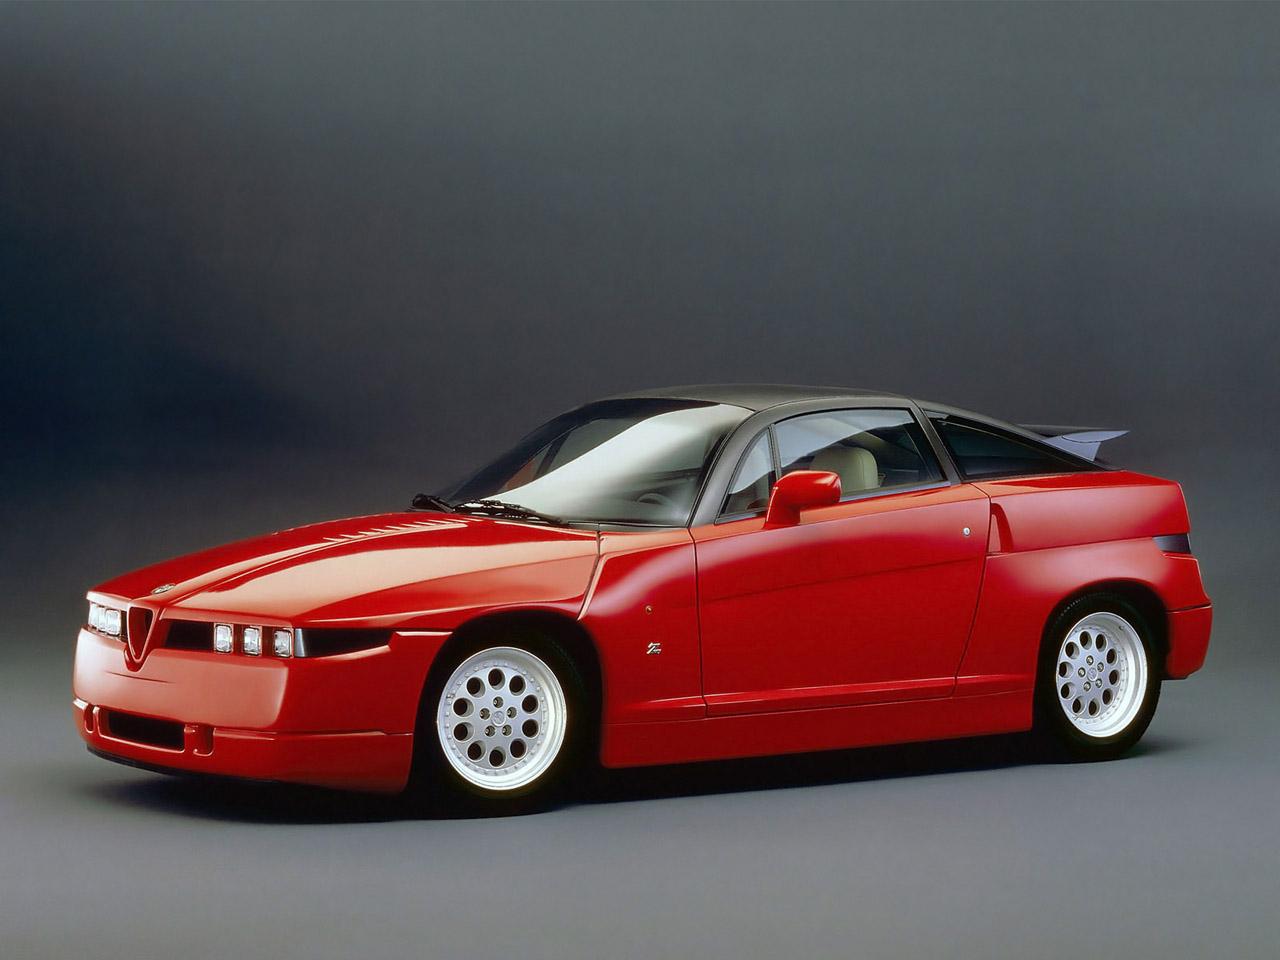 alfa romeo sz sprint zagato experimental sportscar 1989-1991 alfa